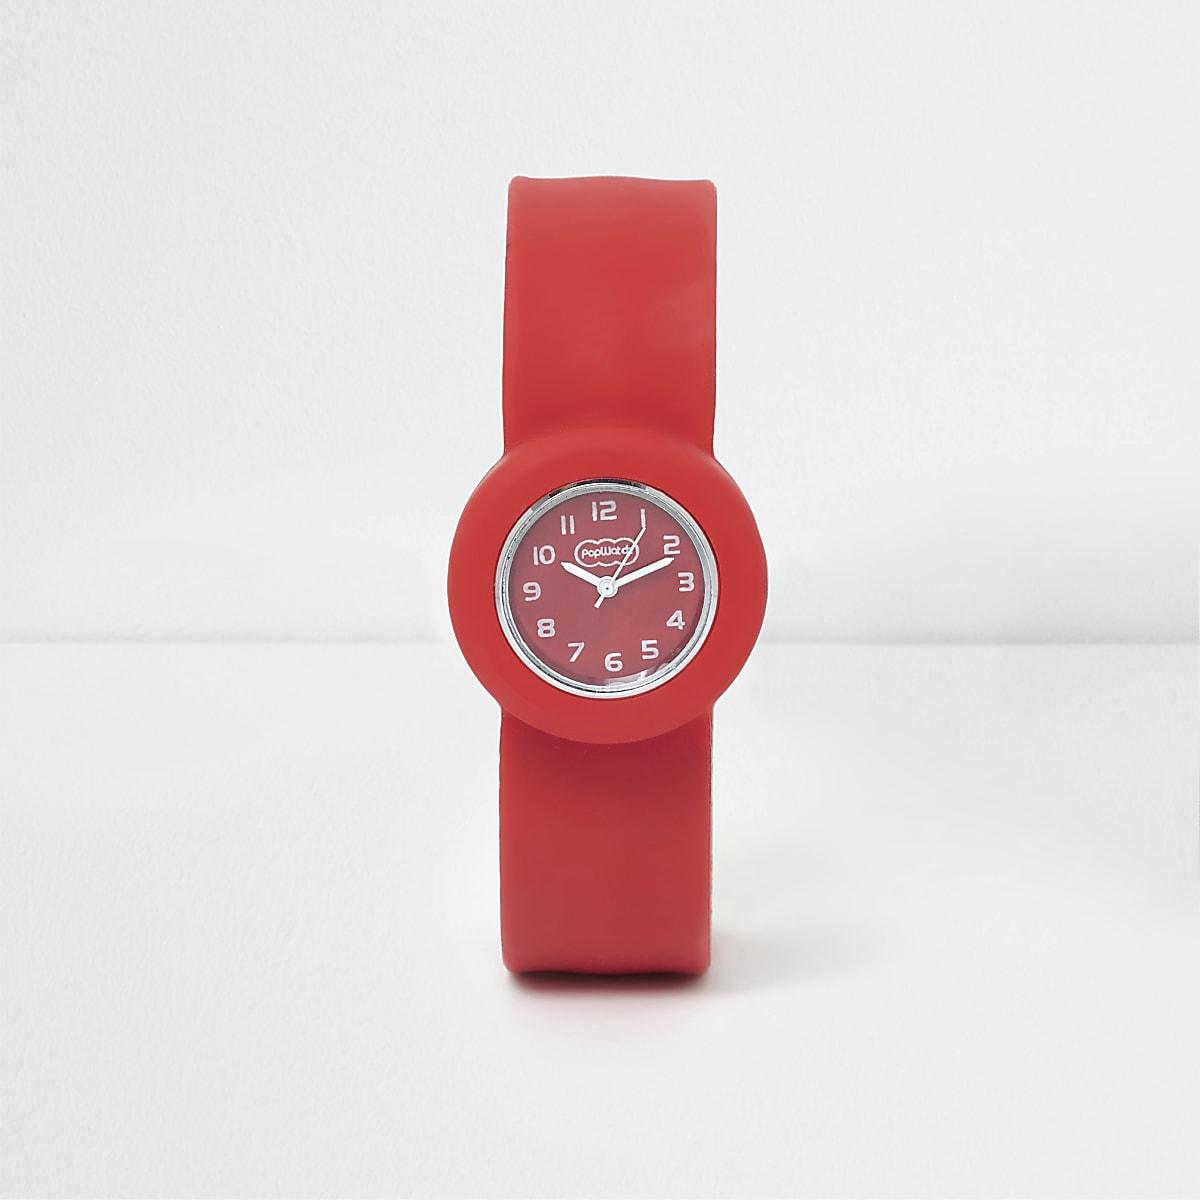 Boys red pop watch